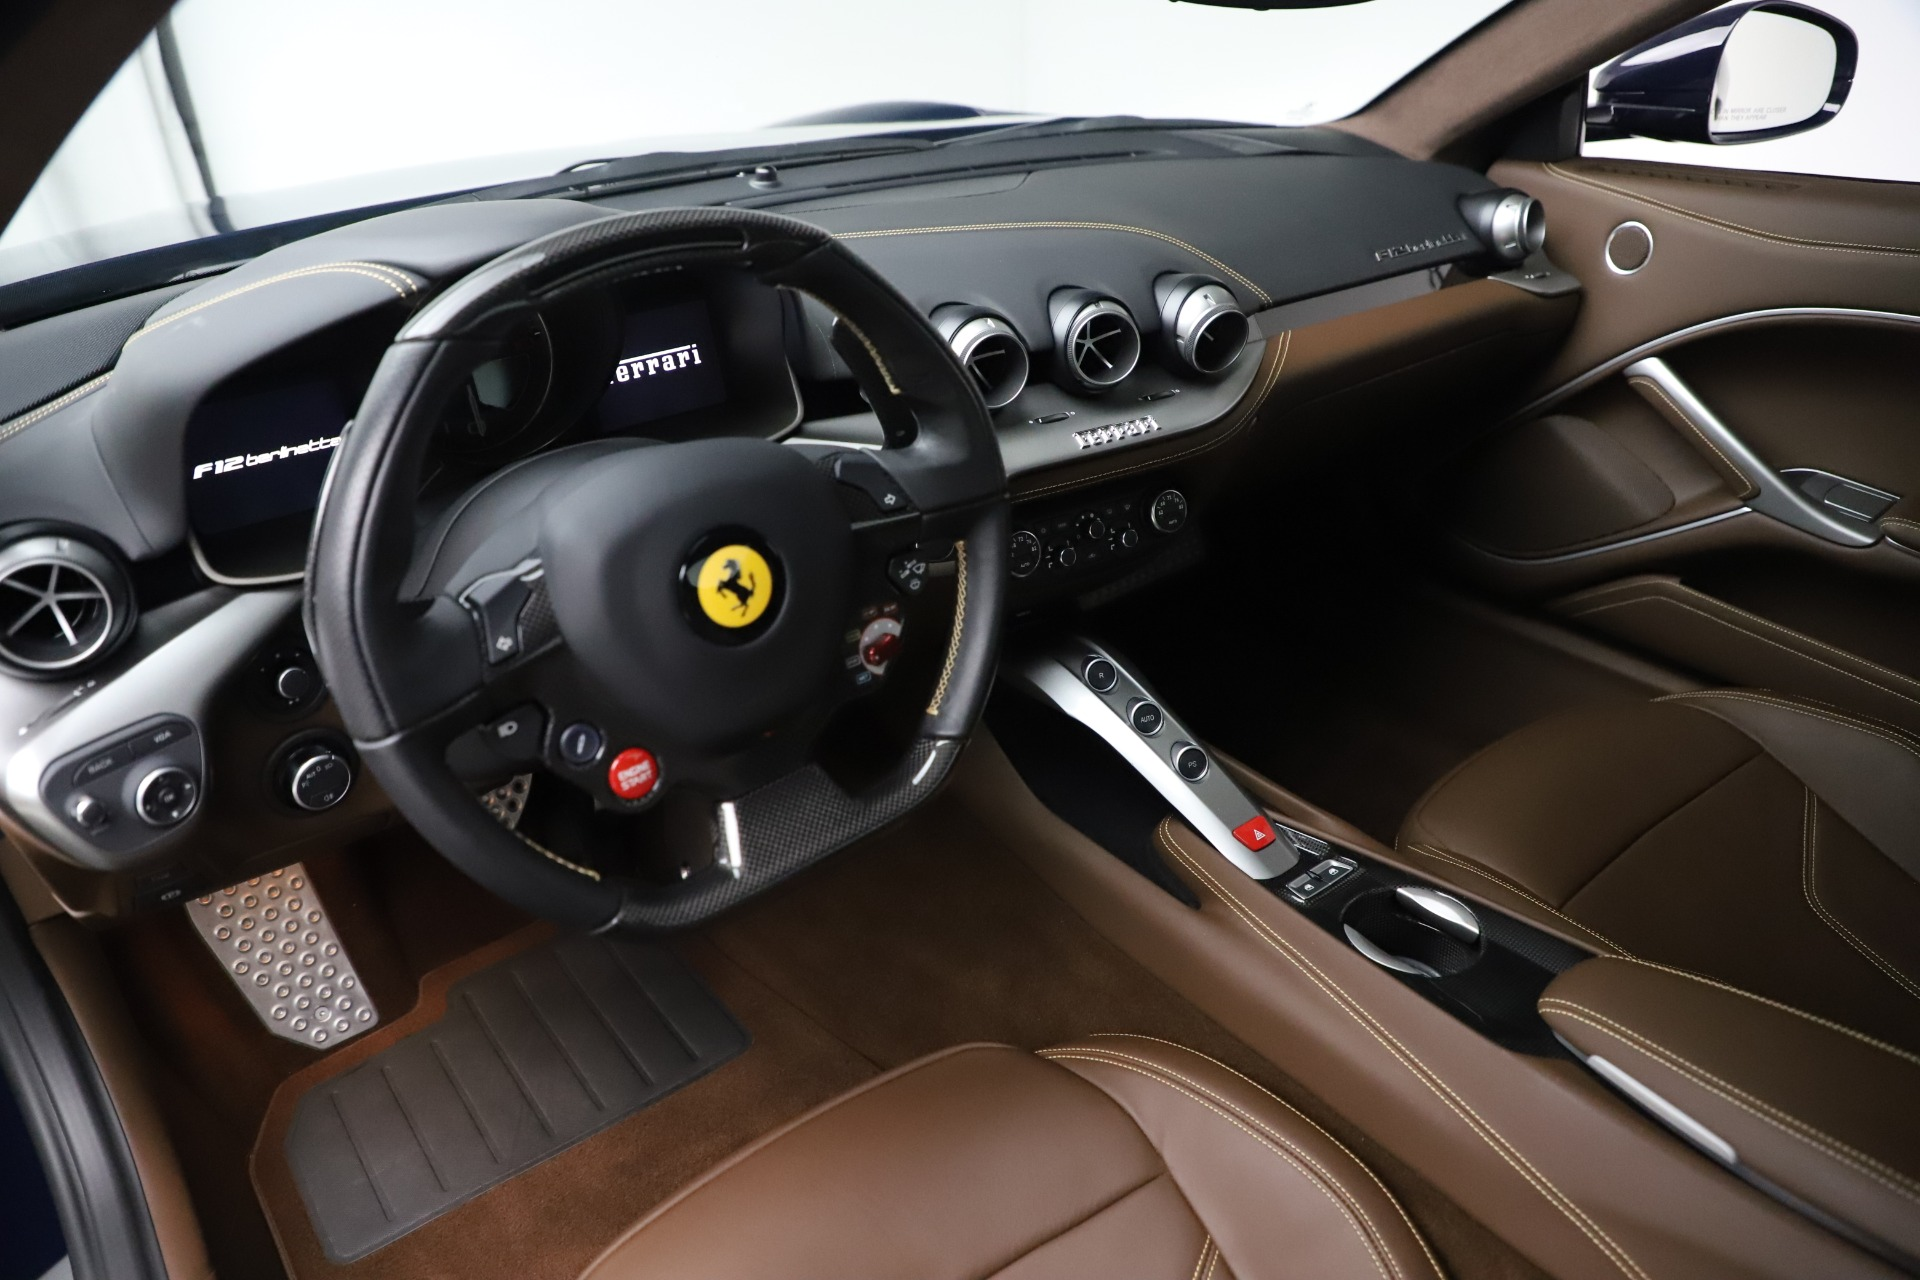 Used 2017 Ferrari F12 Berlinetta Base